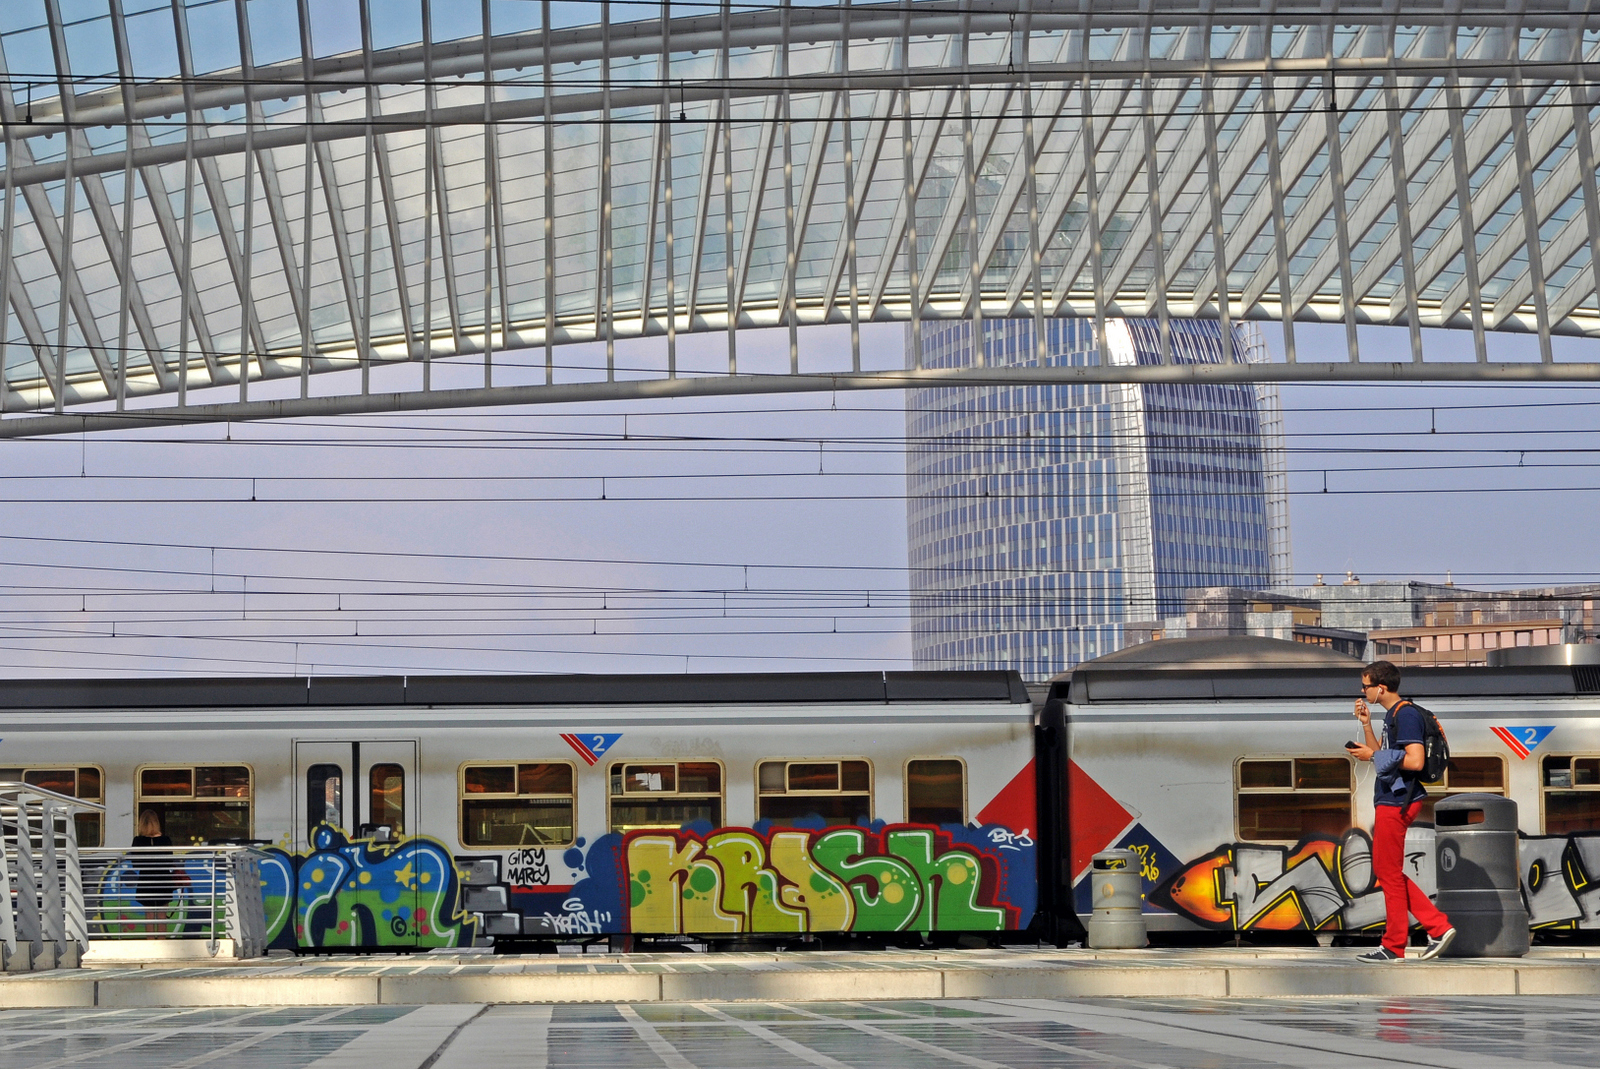 Bahnhof Guillemain